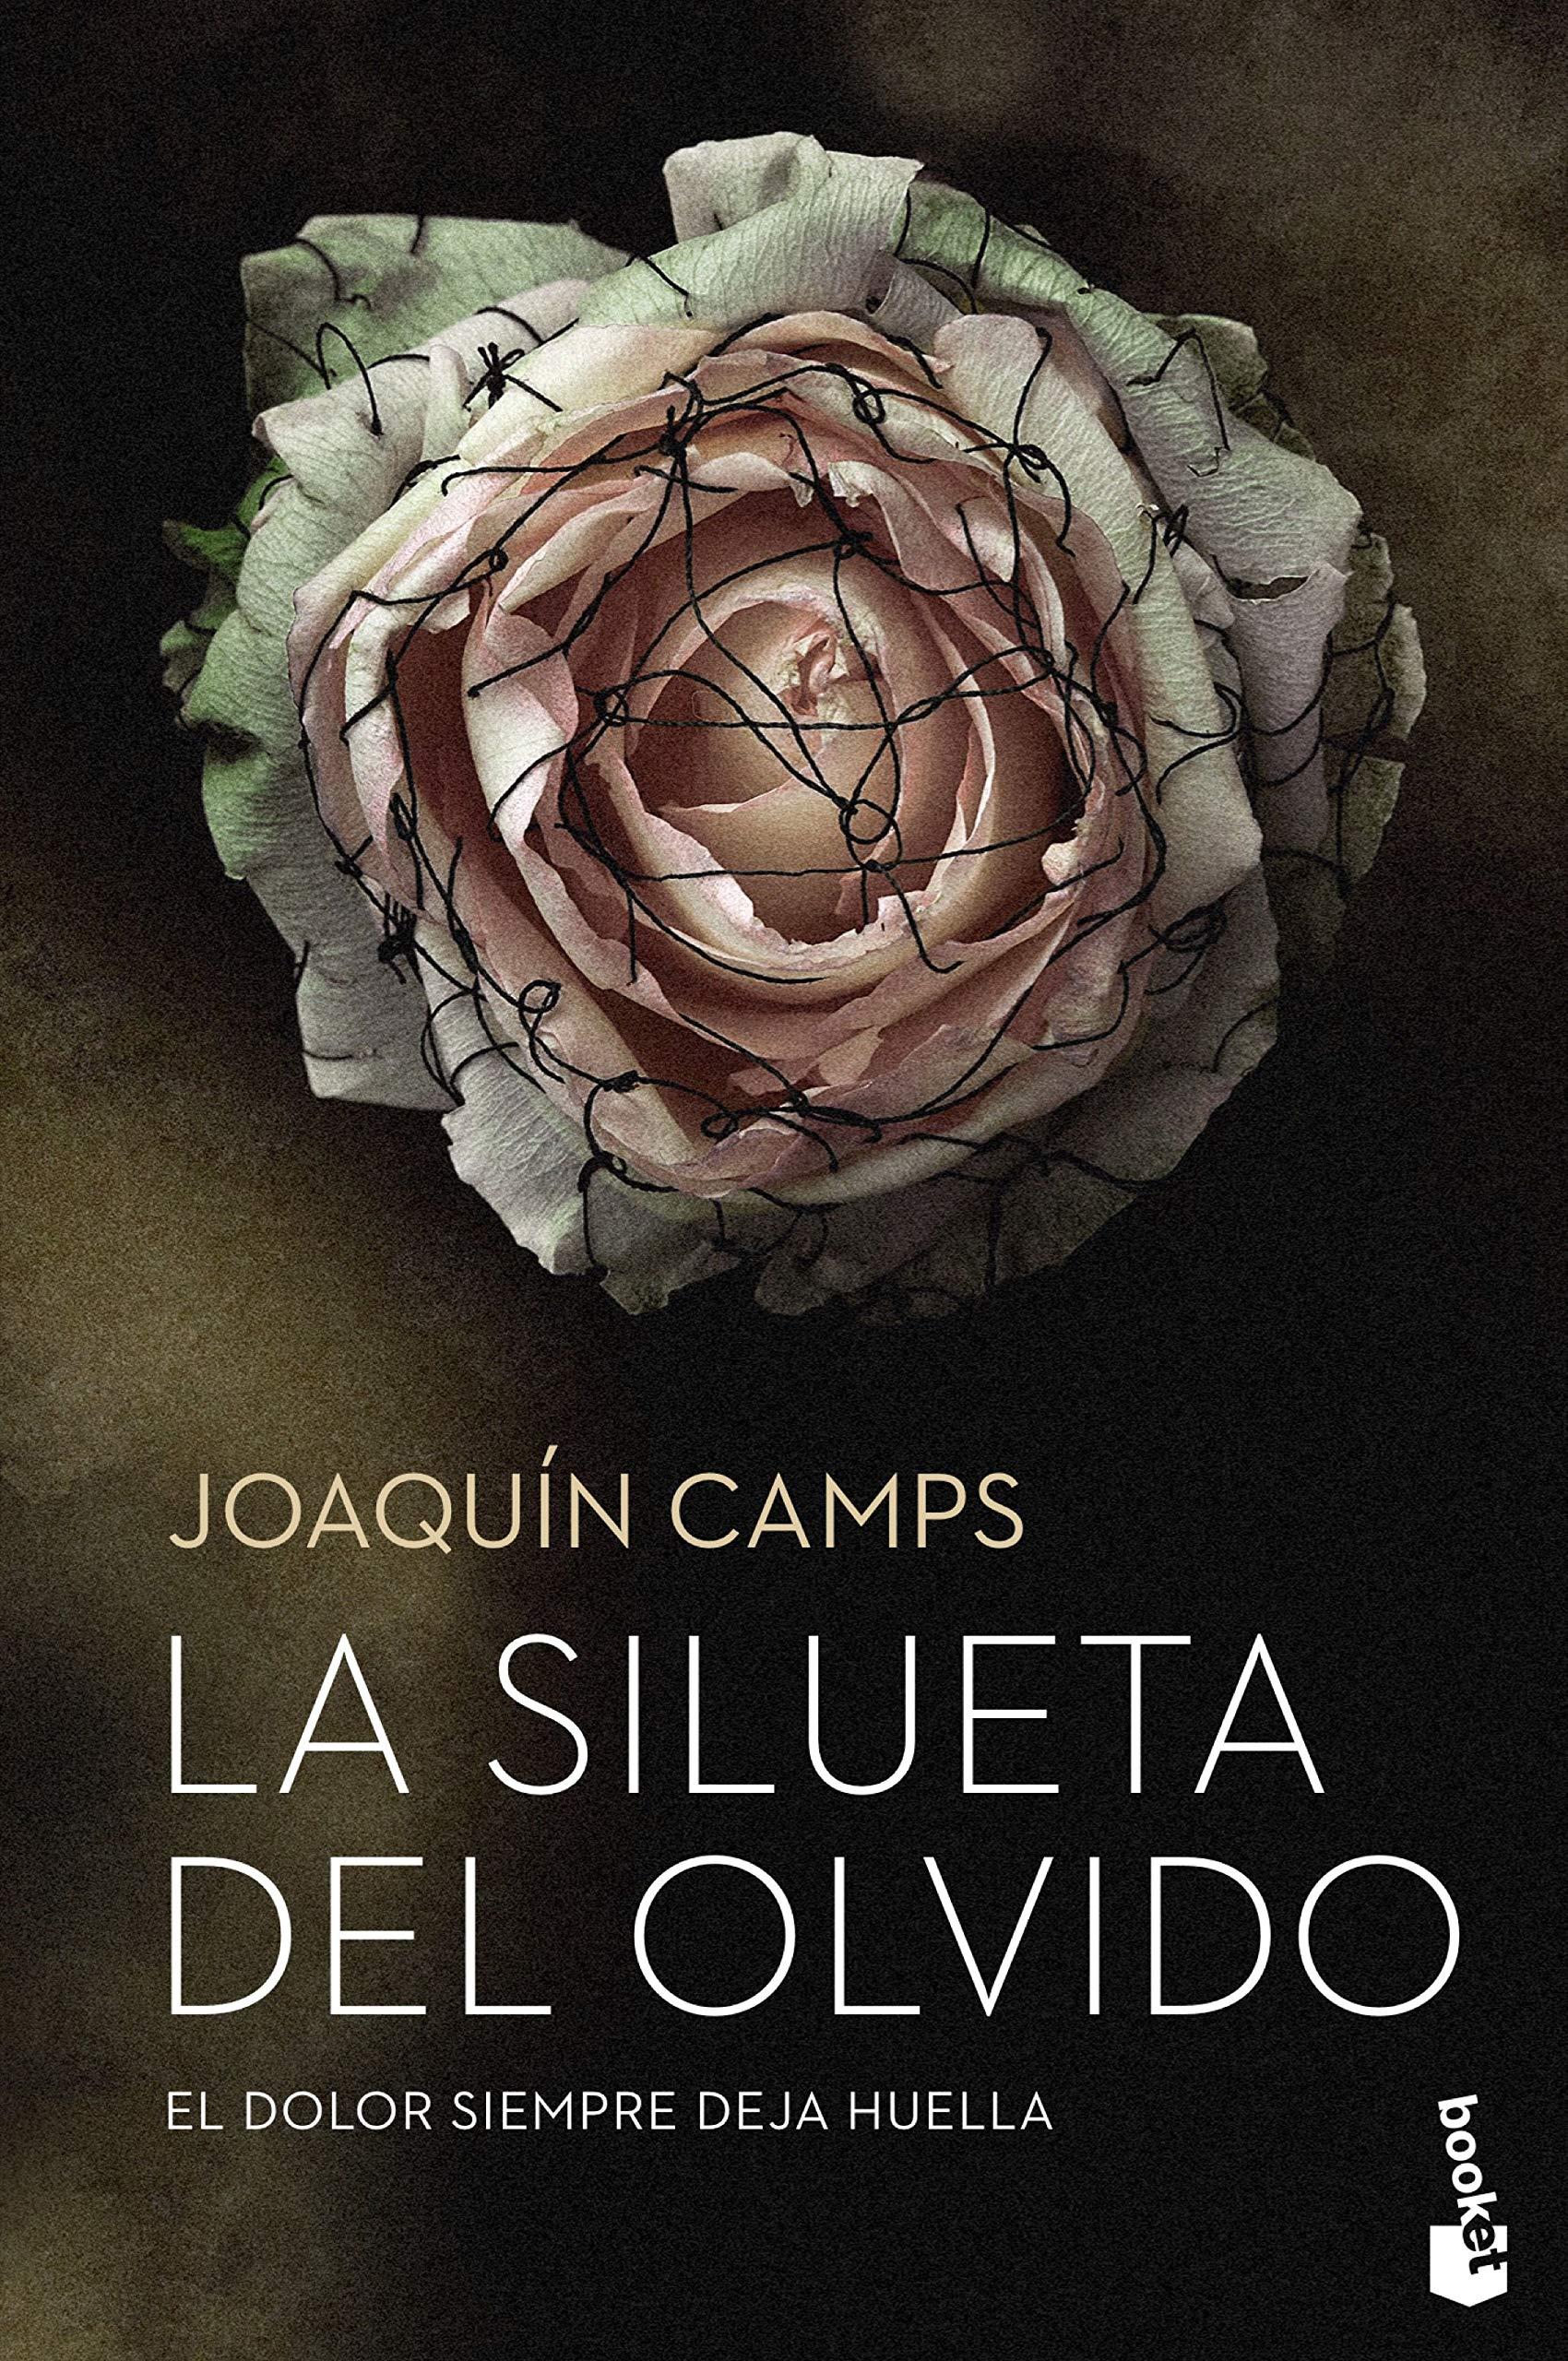 La silueta del olvido (NF Novela): Amazon.es: Camps, Joaquín: Libros